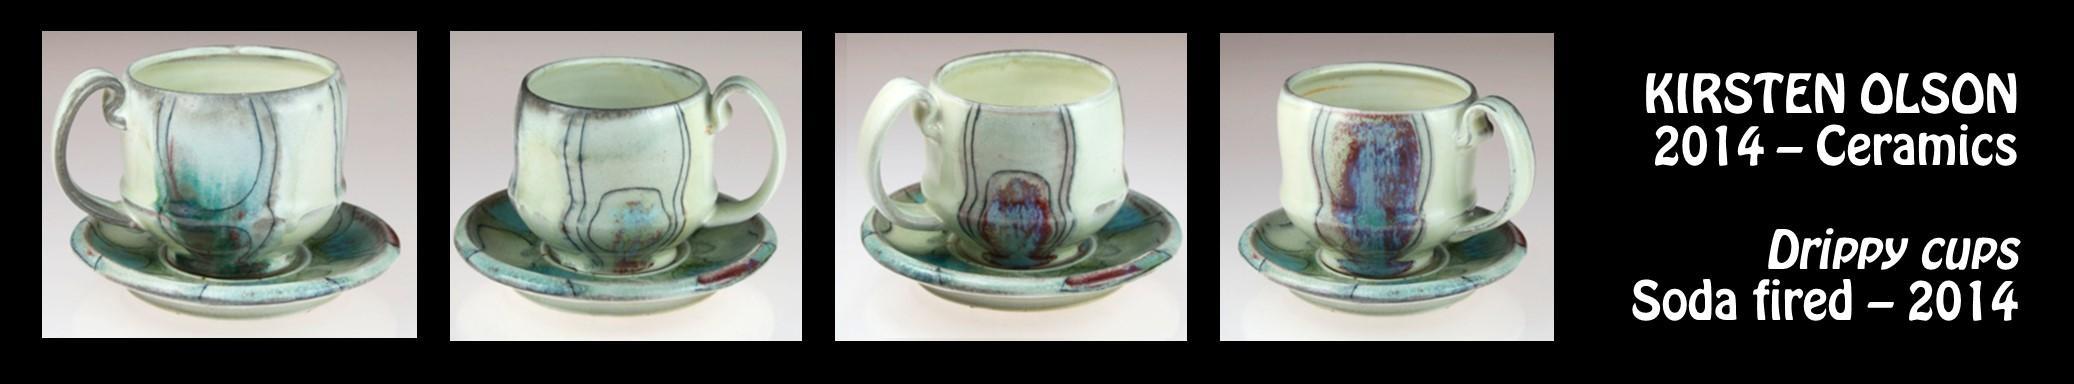 Kristen Olson - Ceramics - Drippy cups - Soda fired - 2014